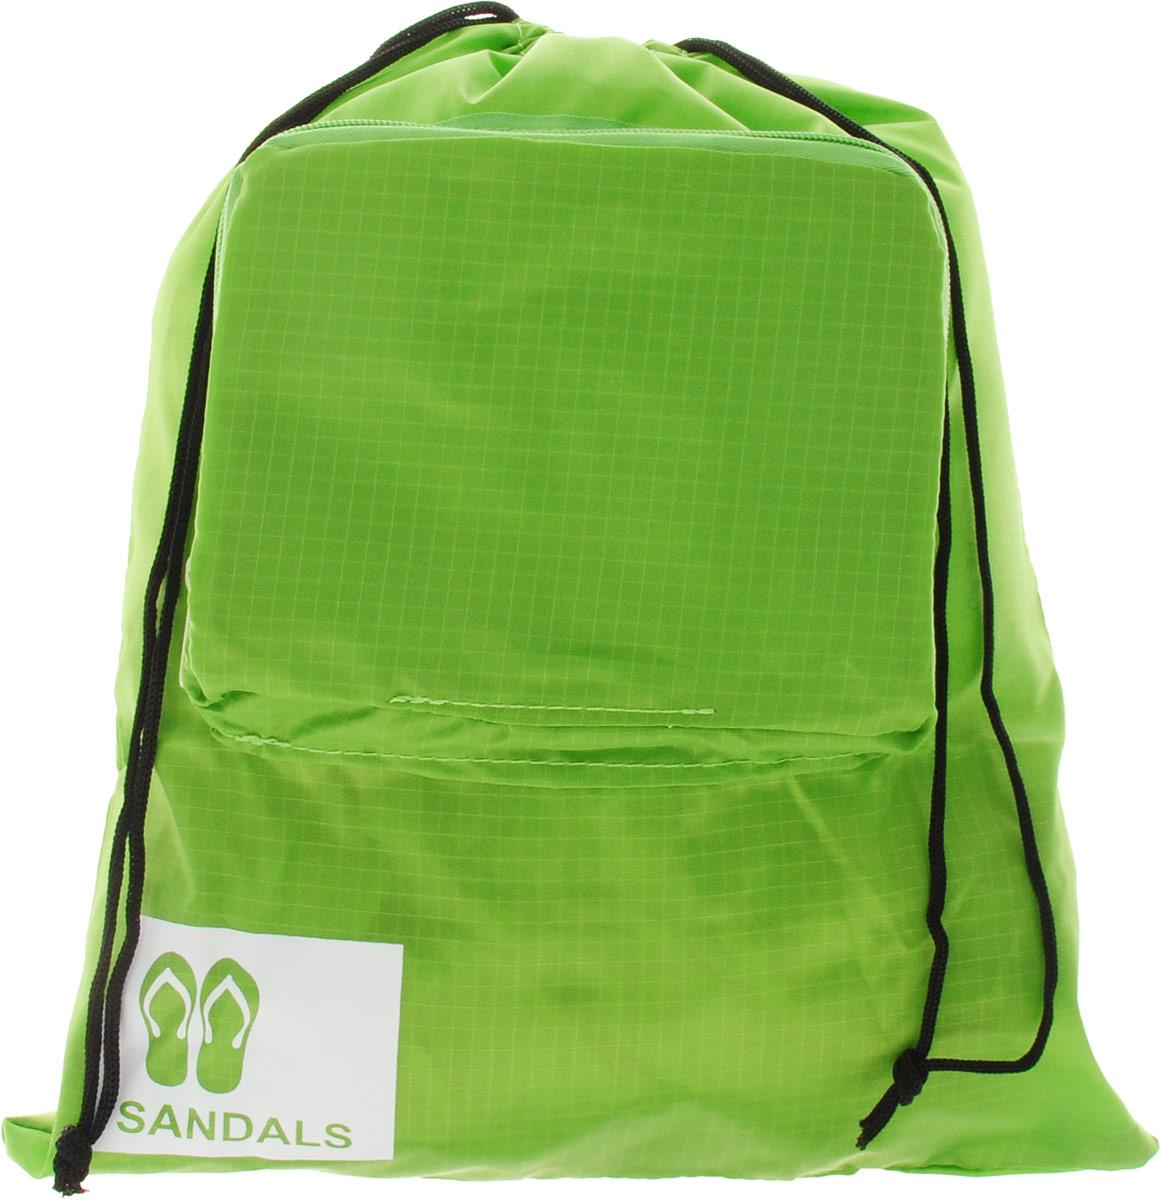 Colibri Чехол для обуви, цвет: зеленый, 39 х 31 см